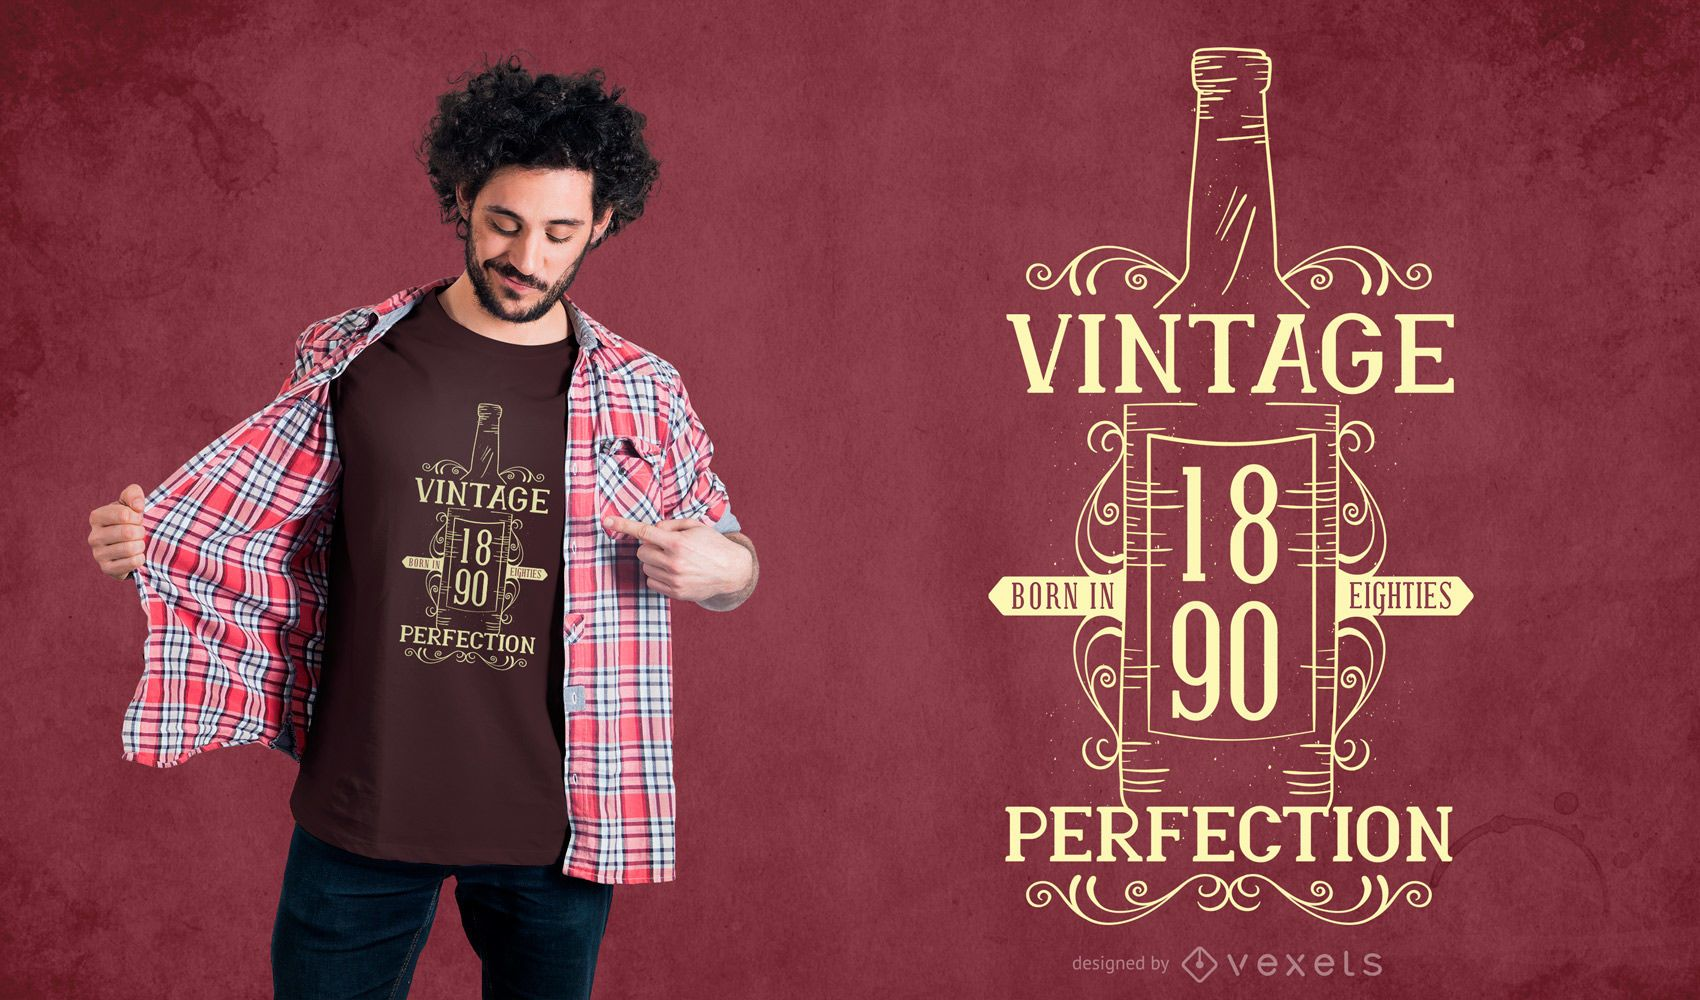 Wine Quote Vintage T-shirt Design